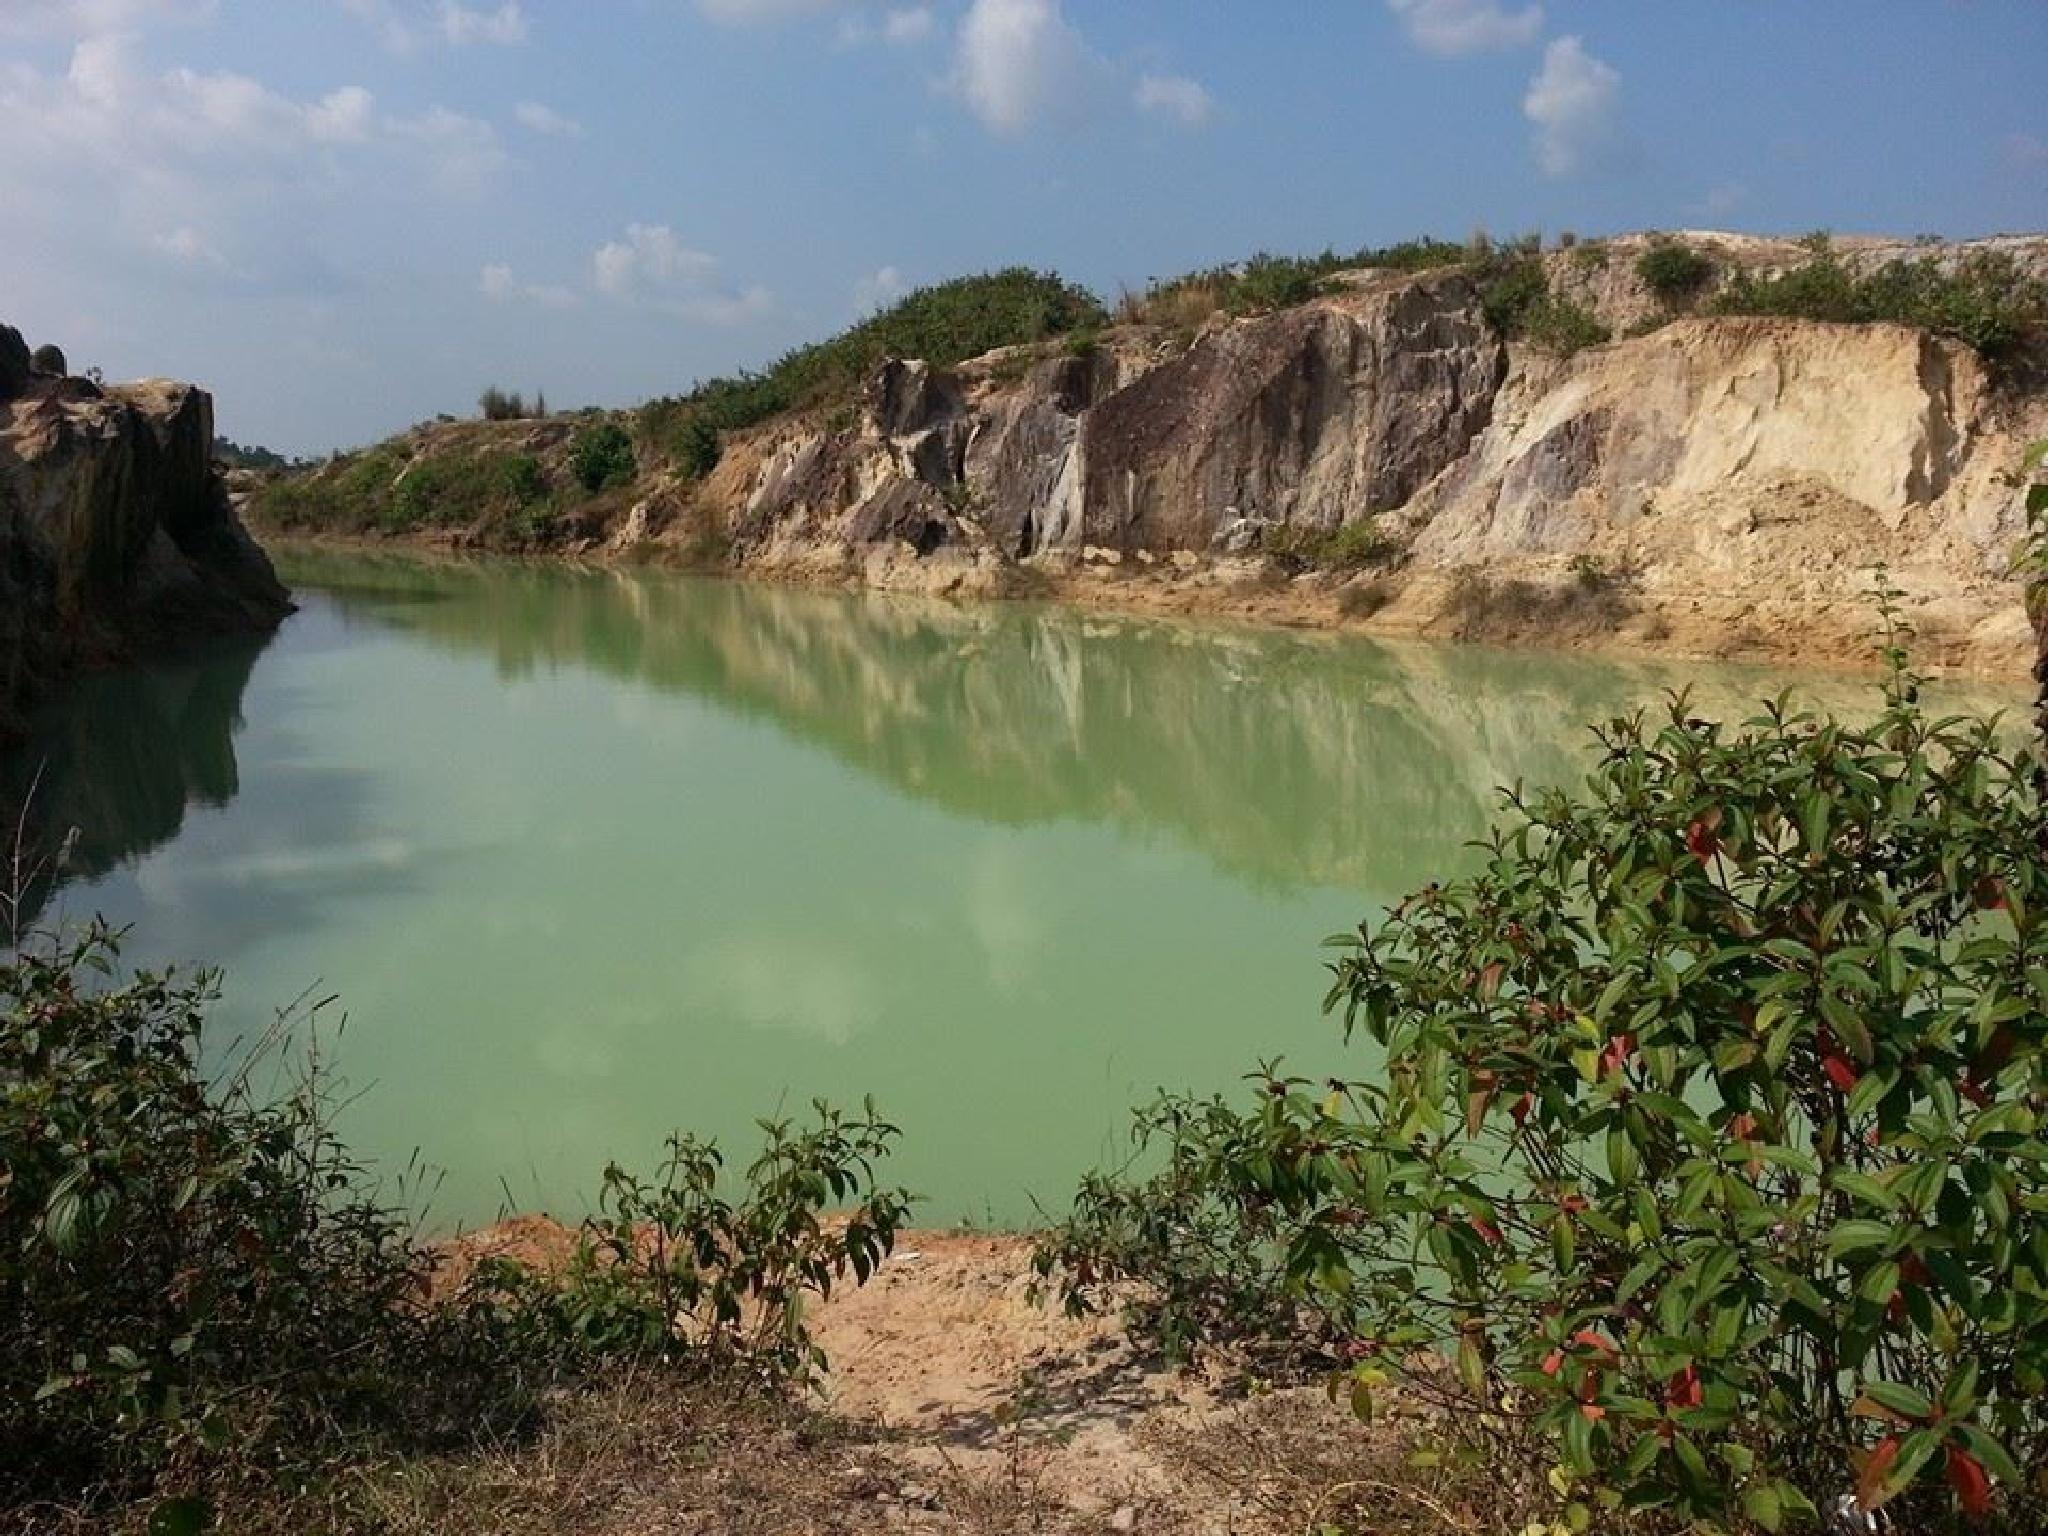 the saphire lake by Raisasabila